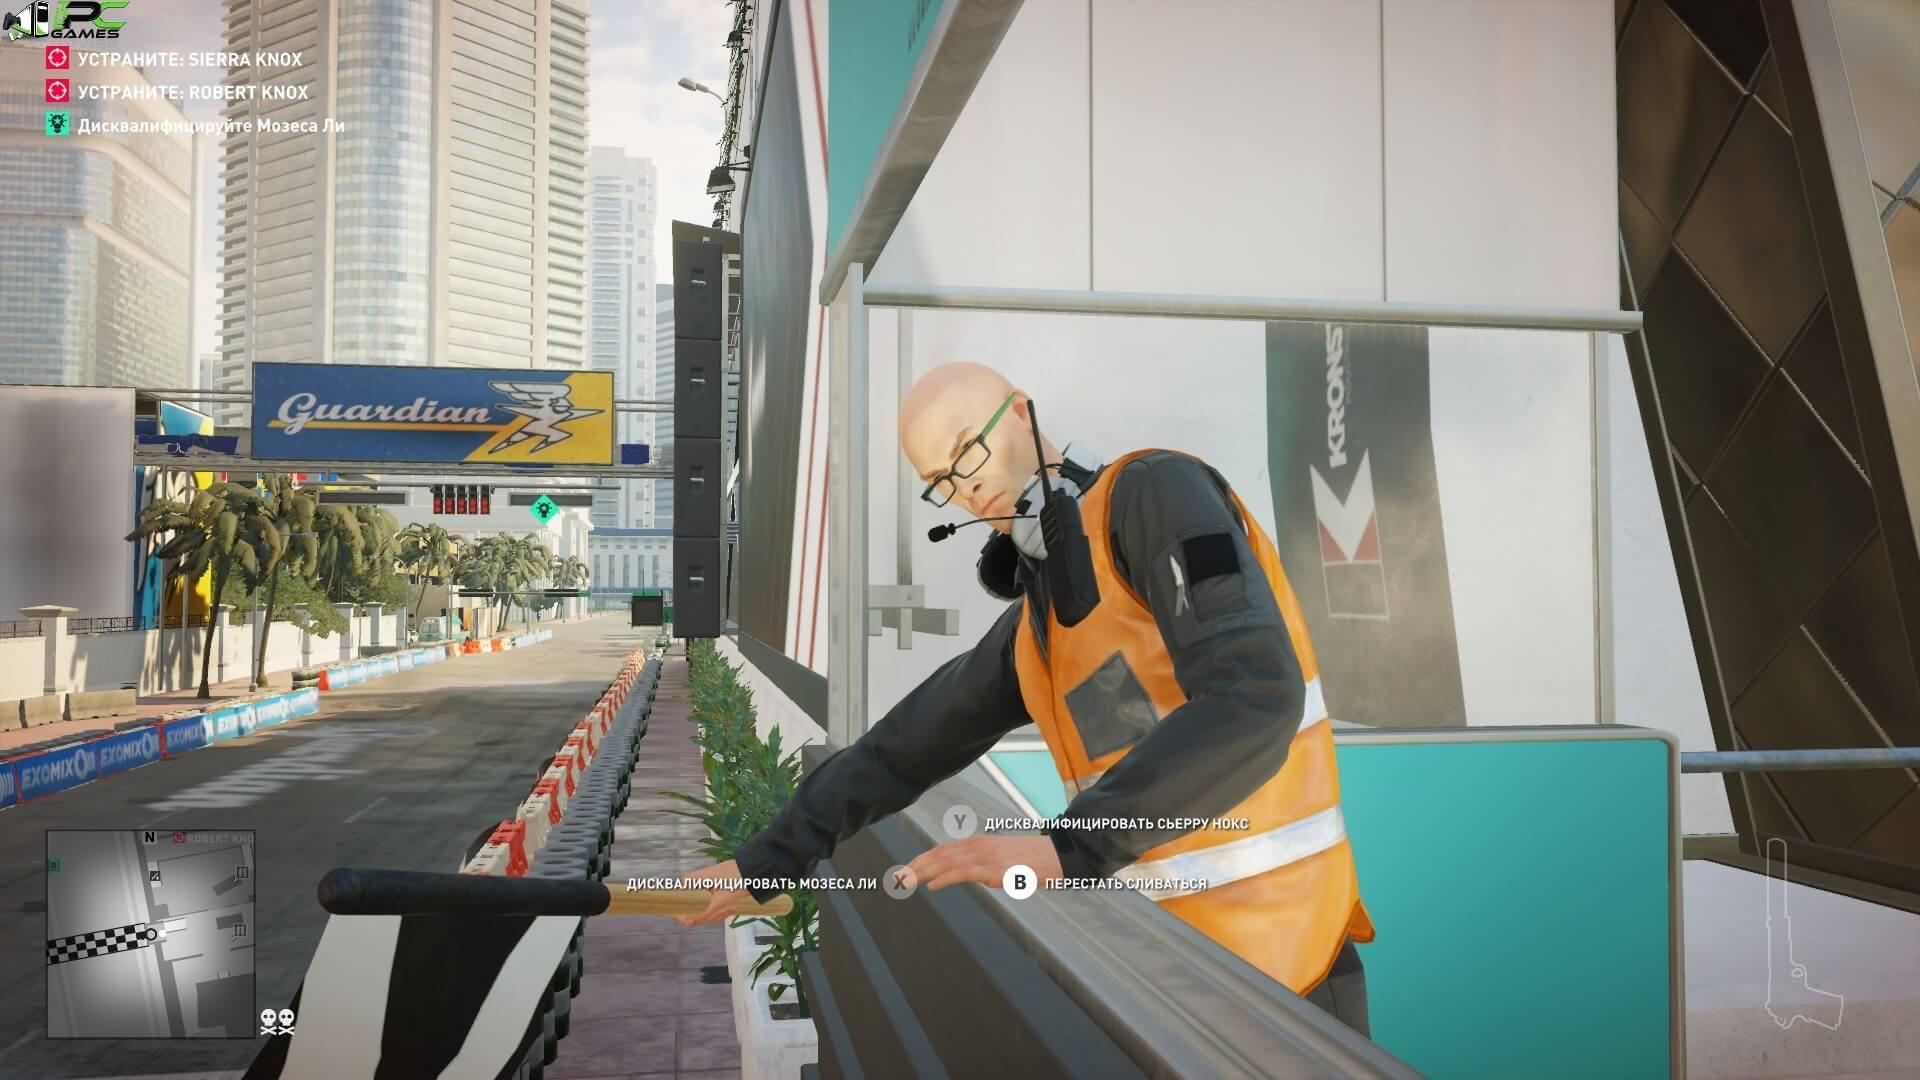 HITMAN 2 PC Game [MULTi11] Free Download